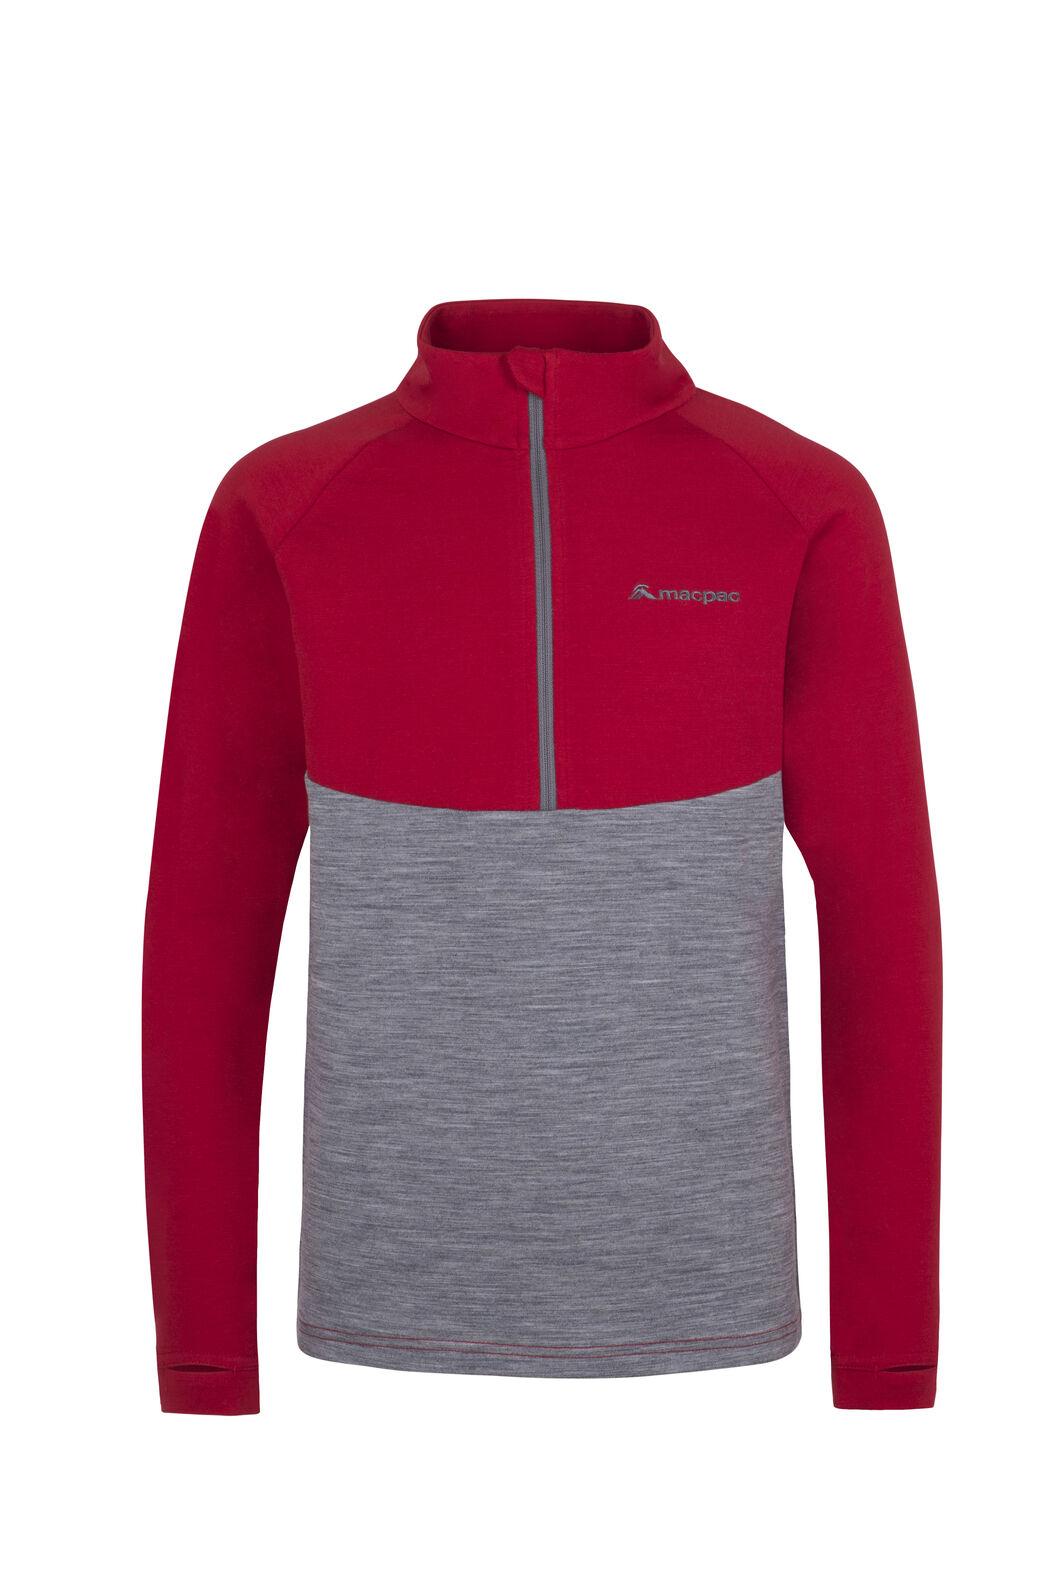 Macpac Merino 280 Pullover - Kids', Haute Red, hi-res